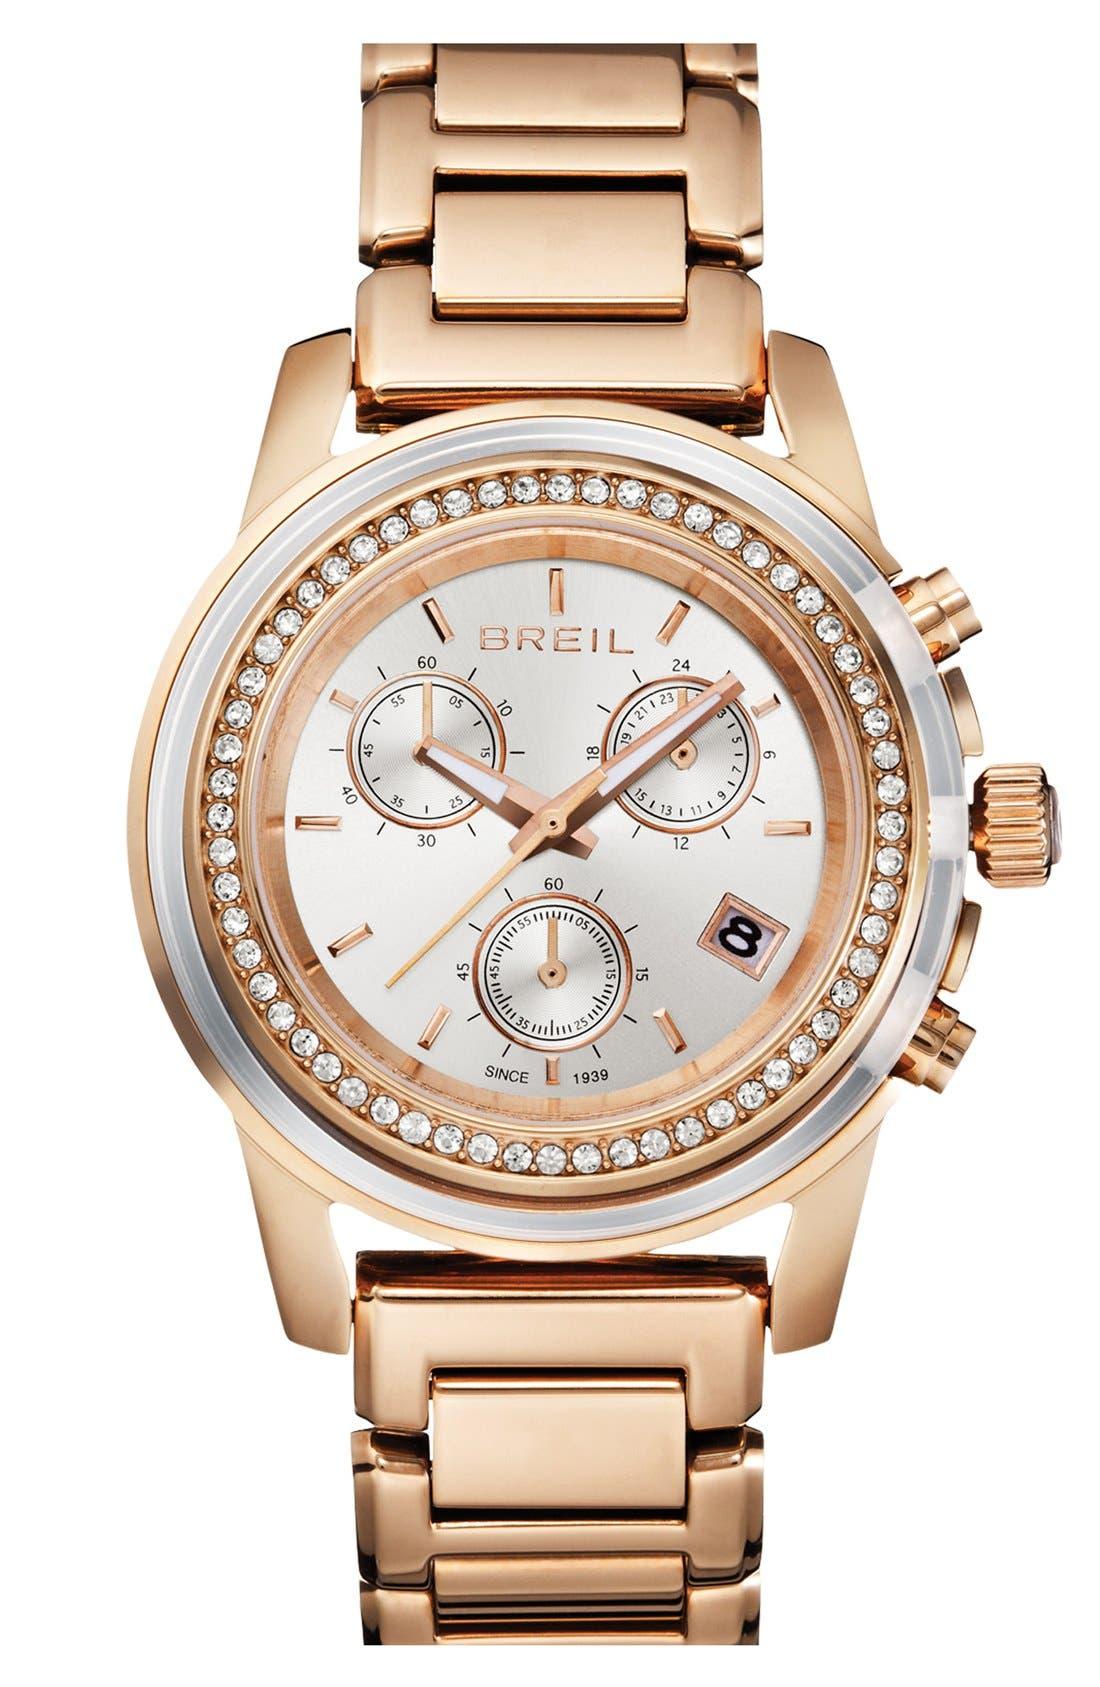 Alternate Image 1 Selected - Breil 'Orchestra' Crystal Bezel Chronograph Bracelet Watch, 37mm